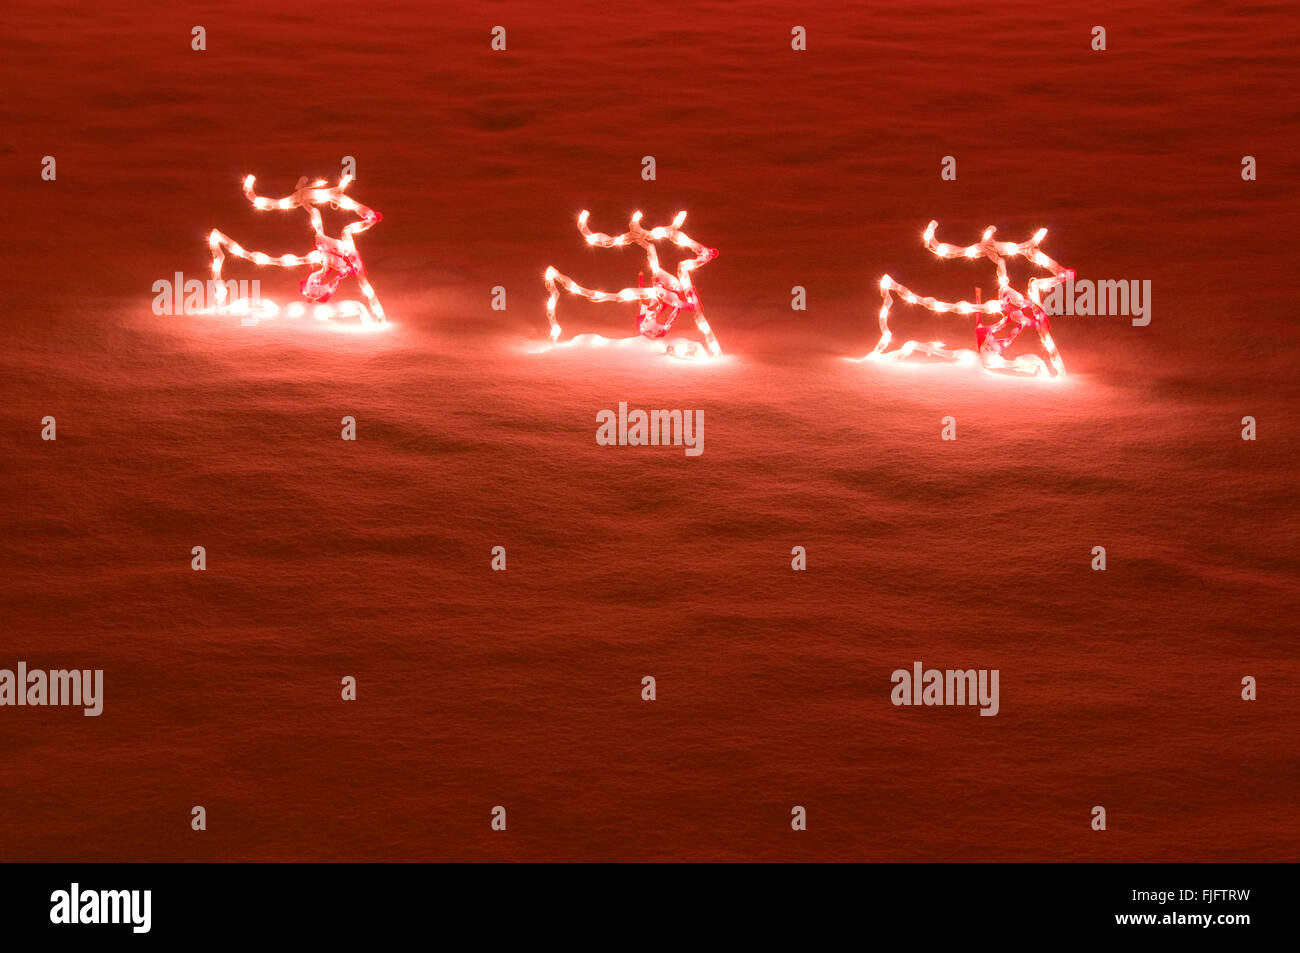 Reindeer Display Stock Photos & Reindeer Display Stock Images - Alamy